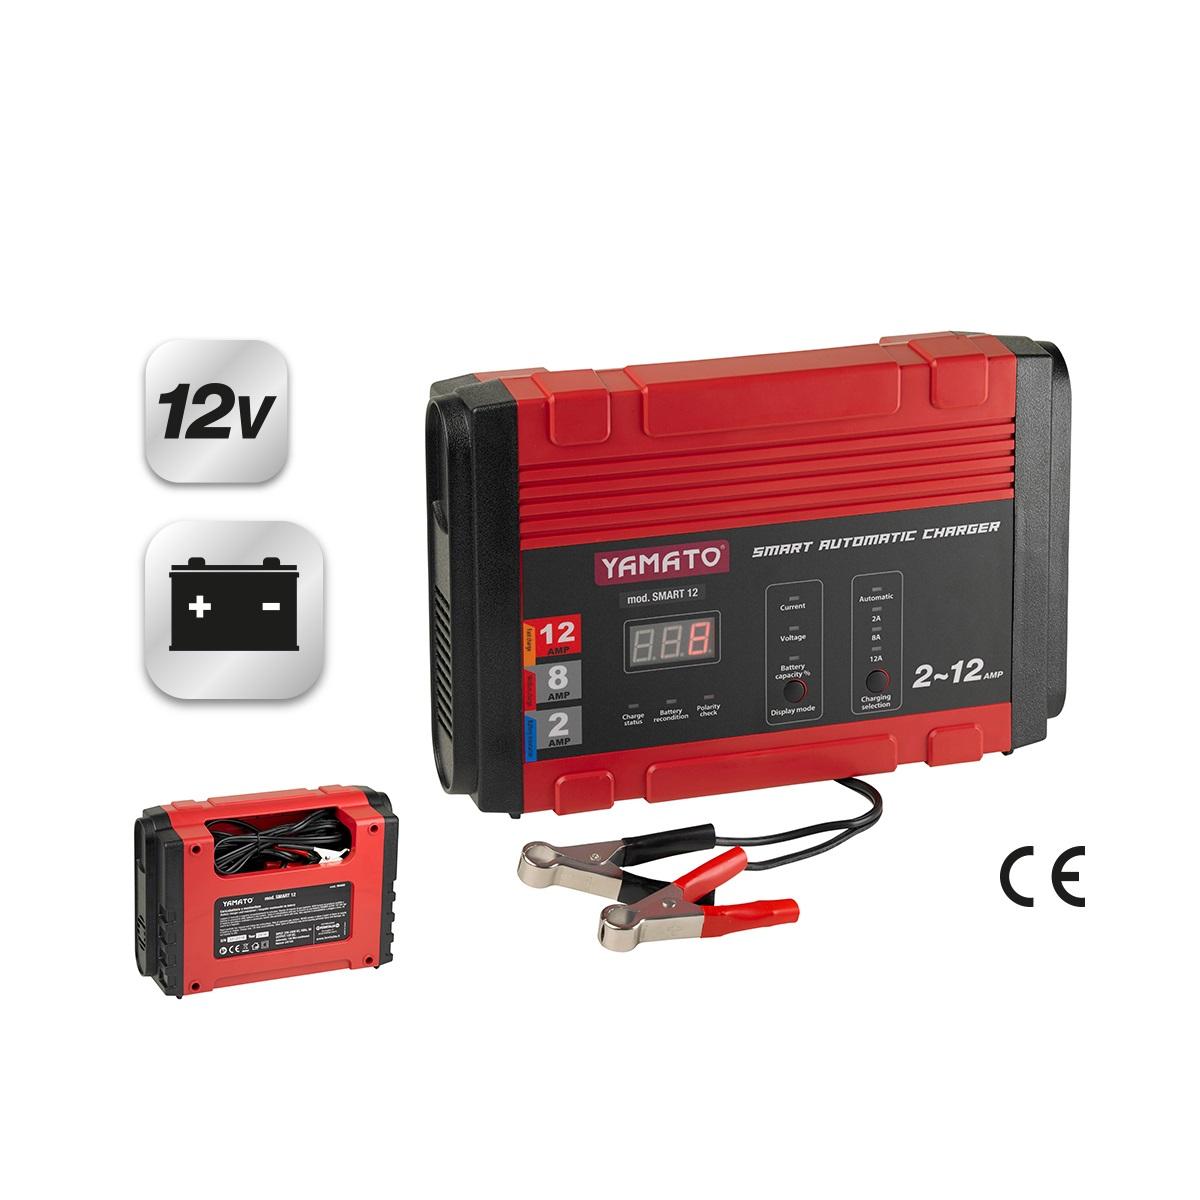 caricabatterie e mantenitore smart 12 yamato